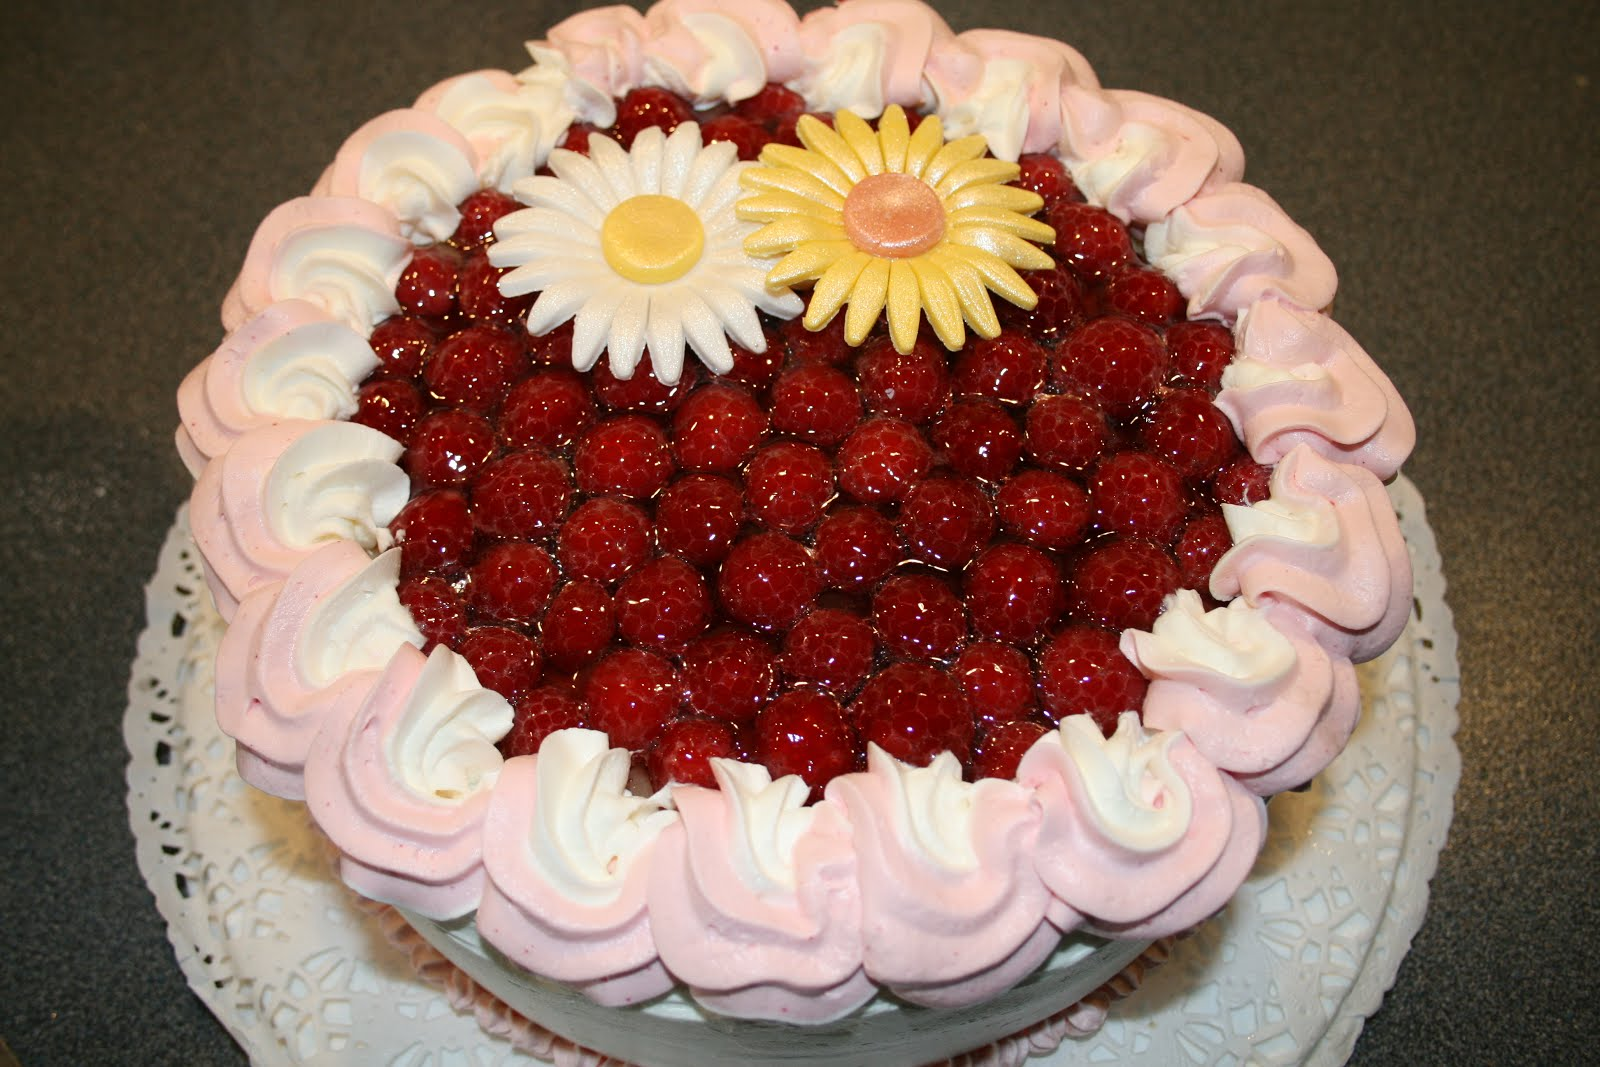 Vadelma-kakku